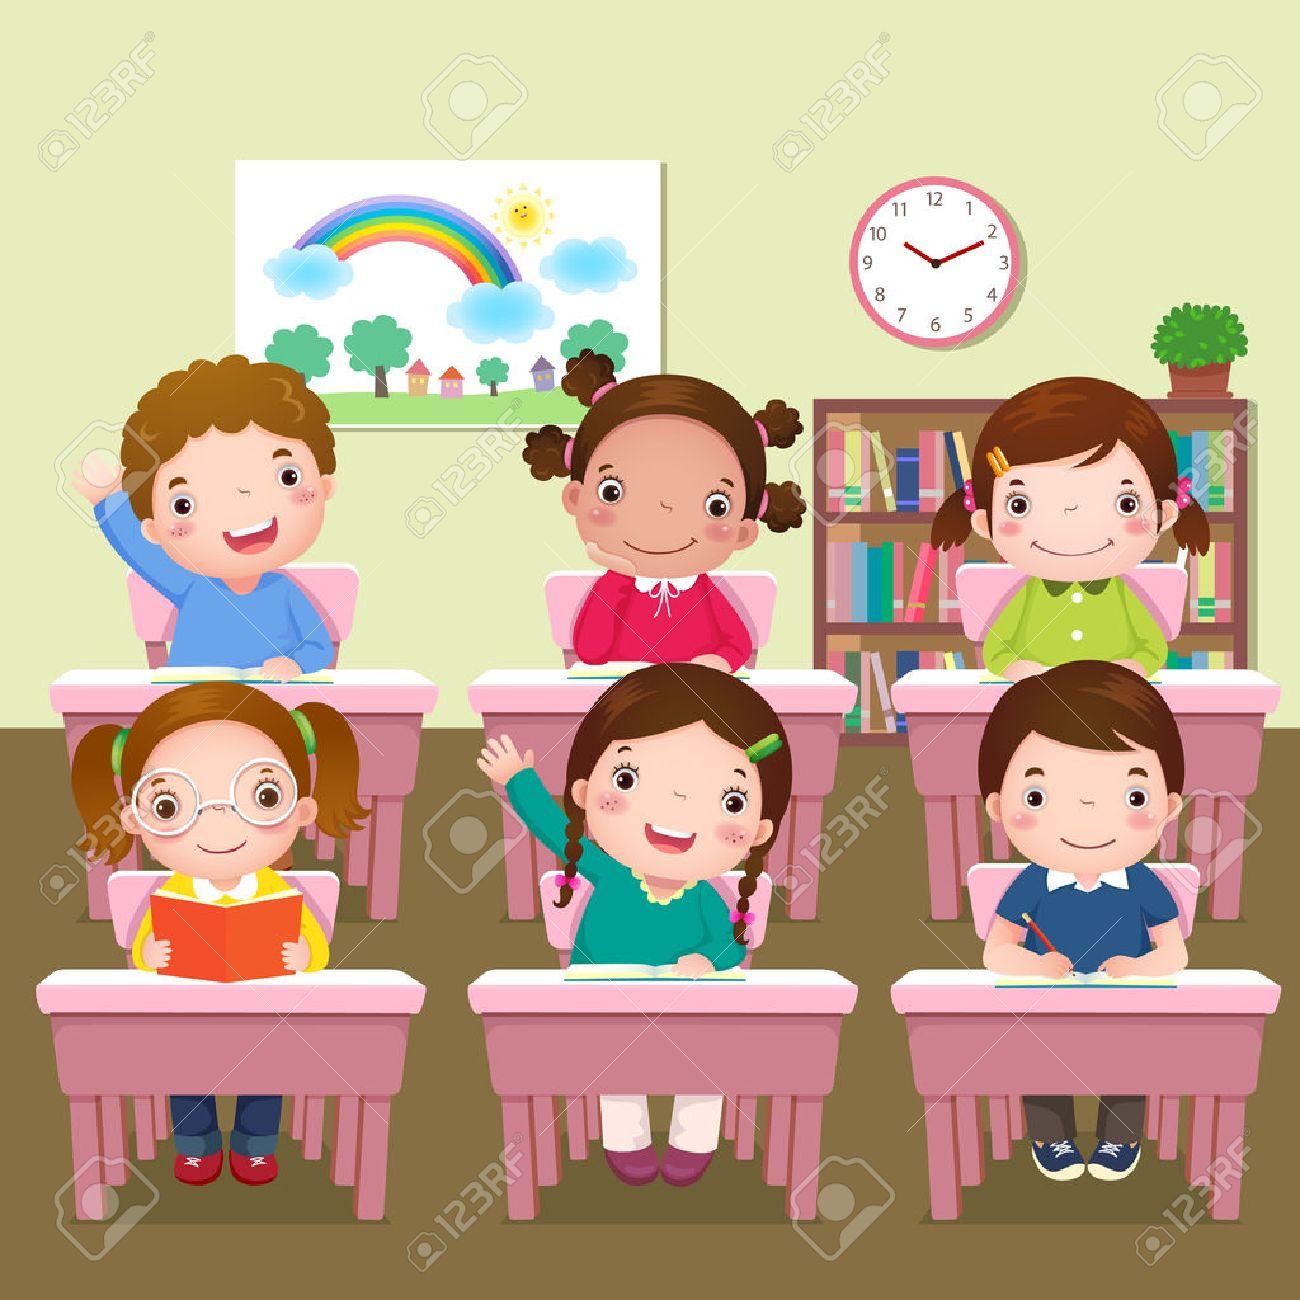 Illustration of school kids studying in classroom - 51009961